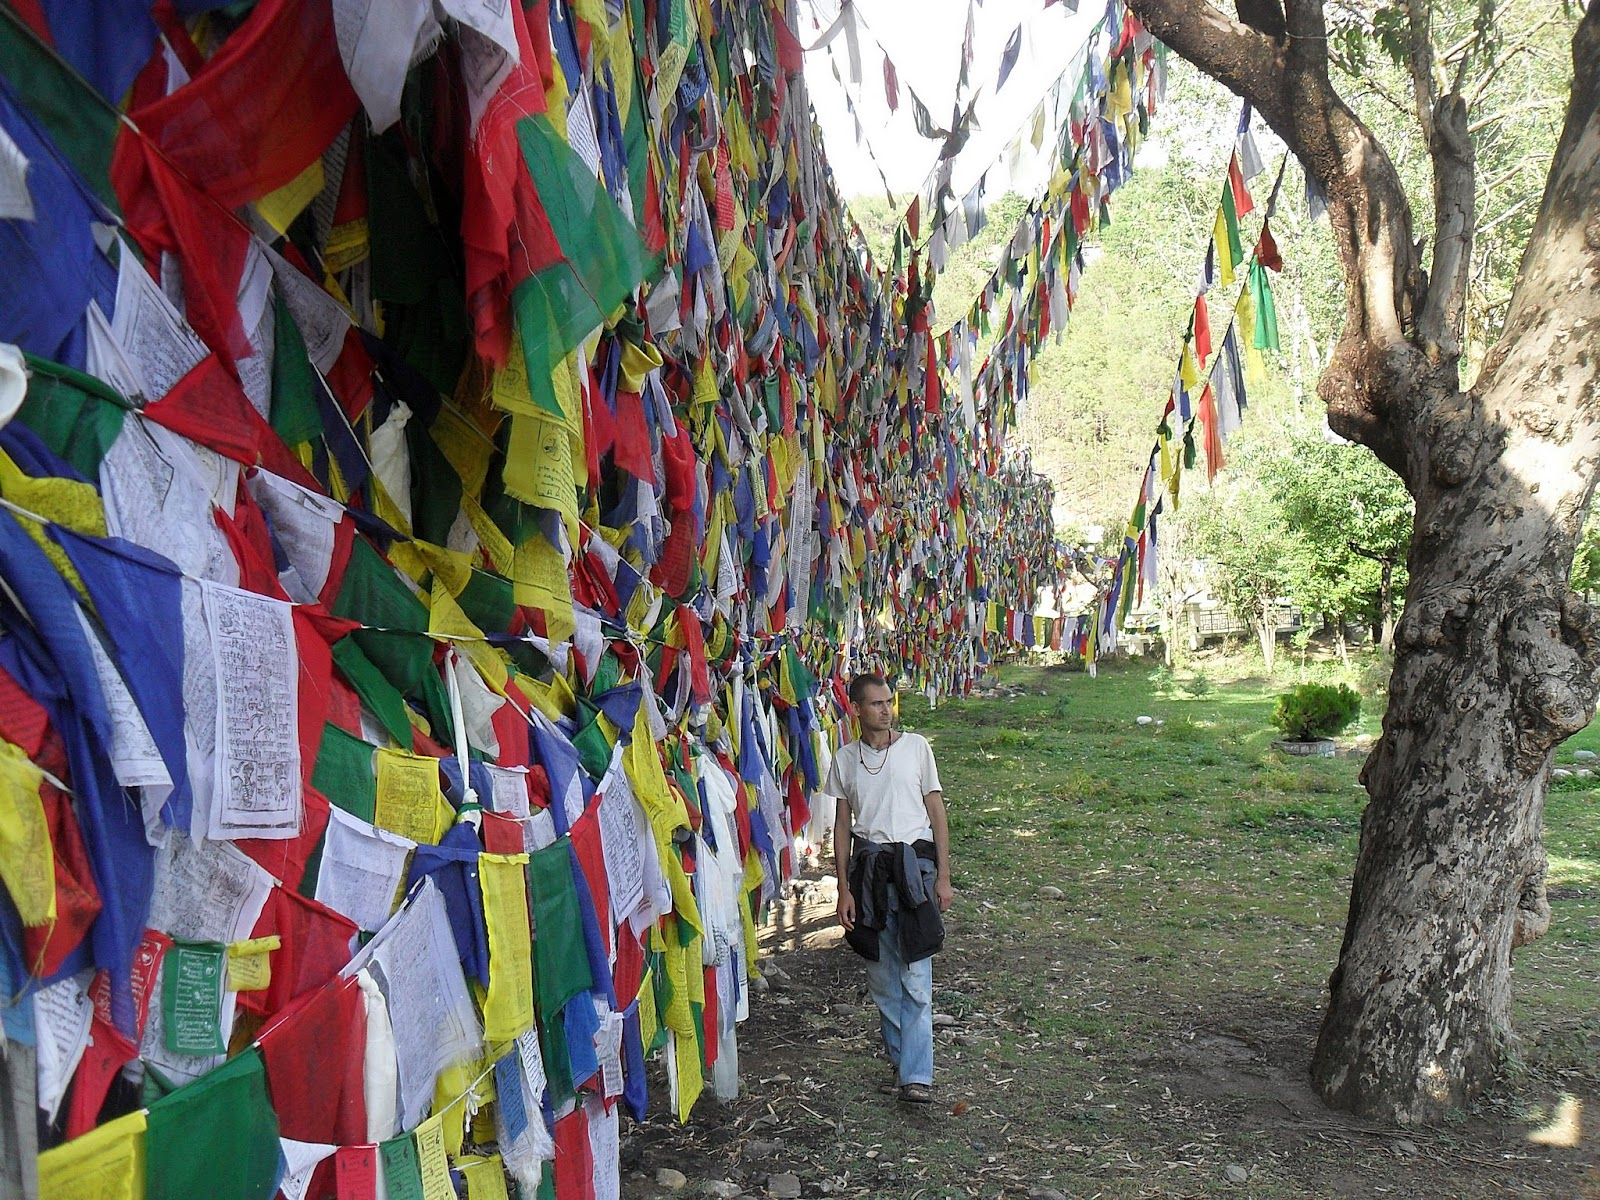 стена из тибетских флажков около озера Ревалсар